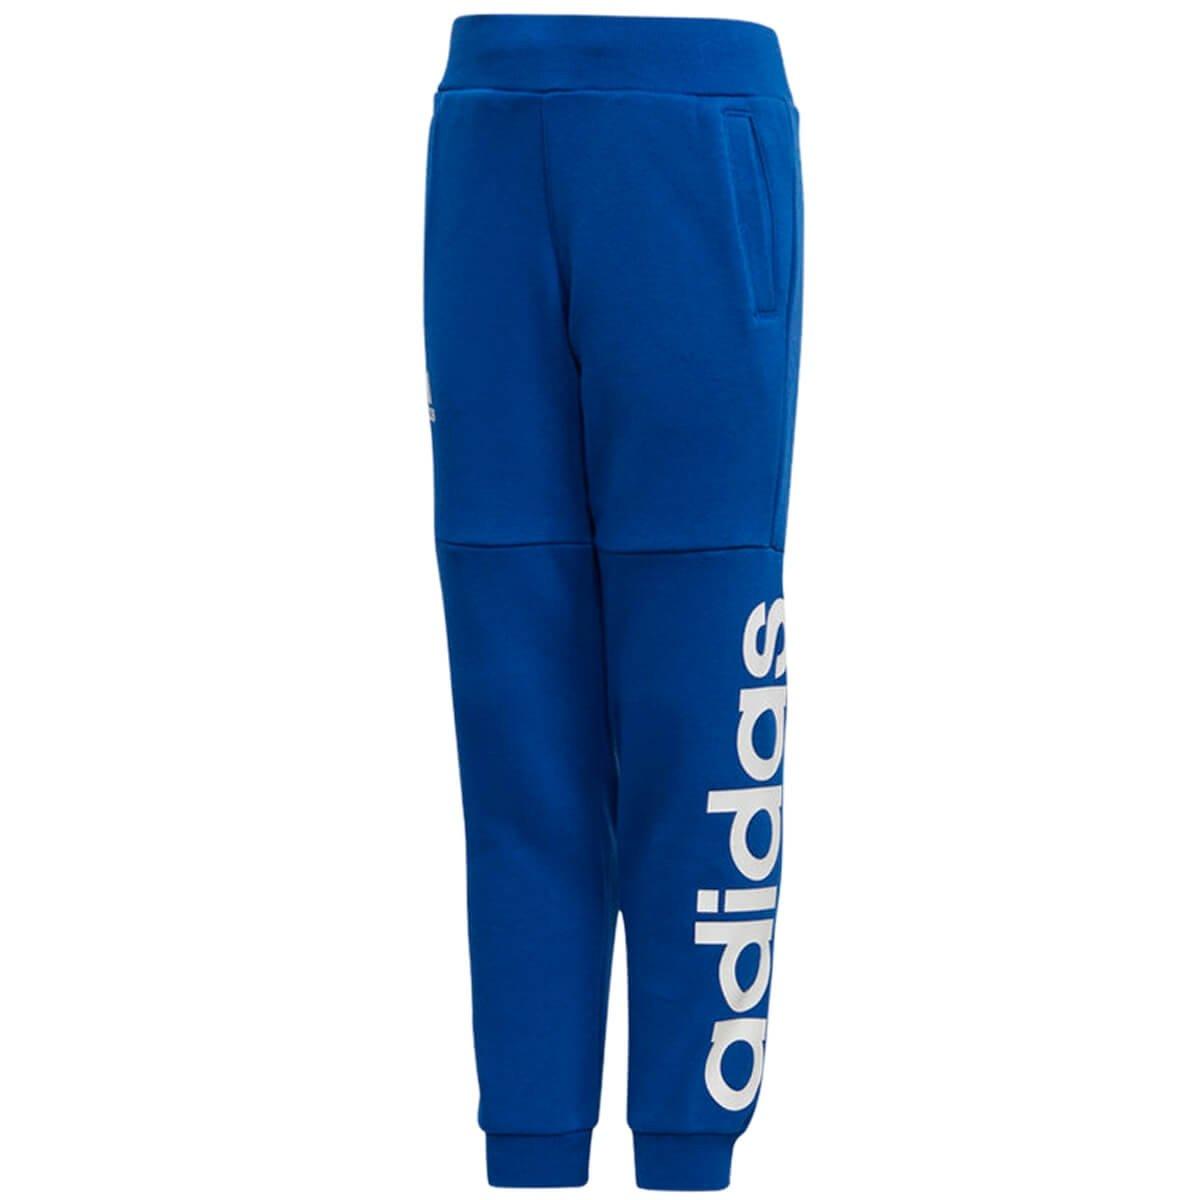 1a036bf831 Bizz Store - Calça Infantil Masculina Adidas LK Lin Sweat Moletom